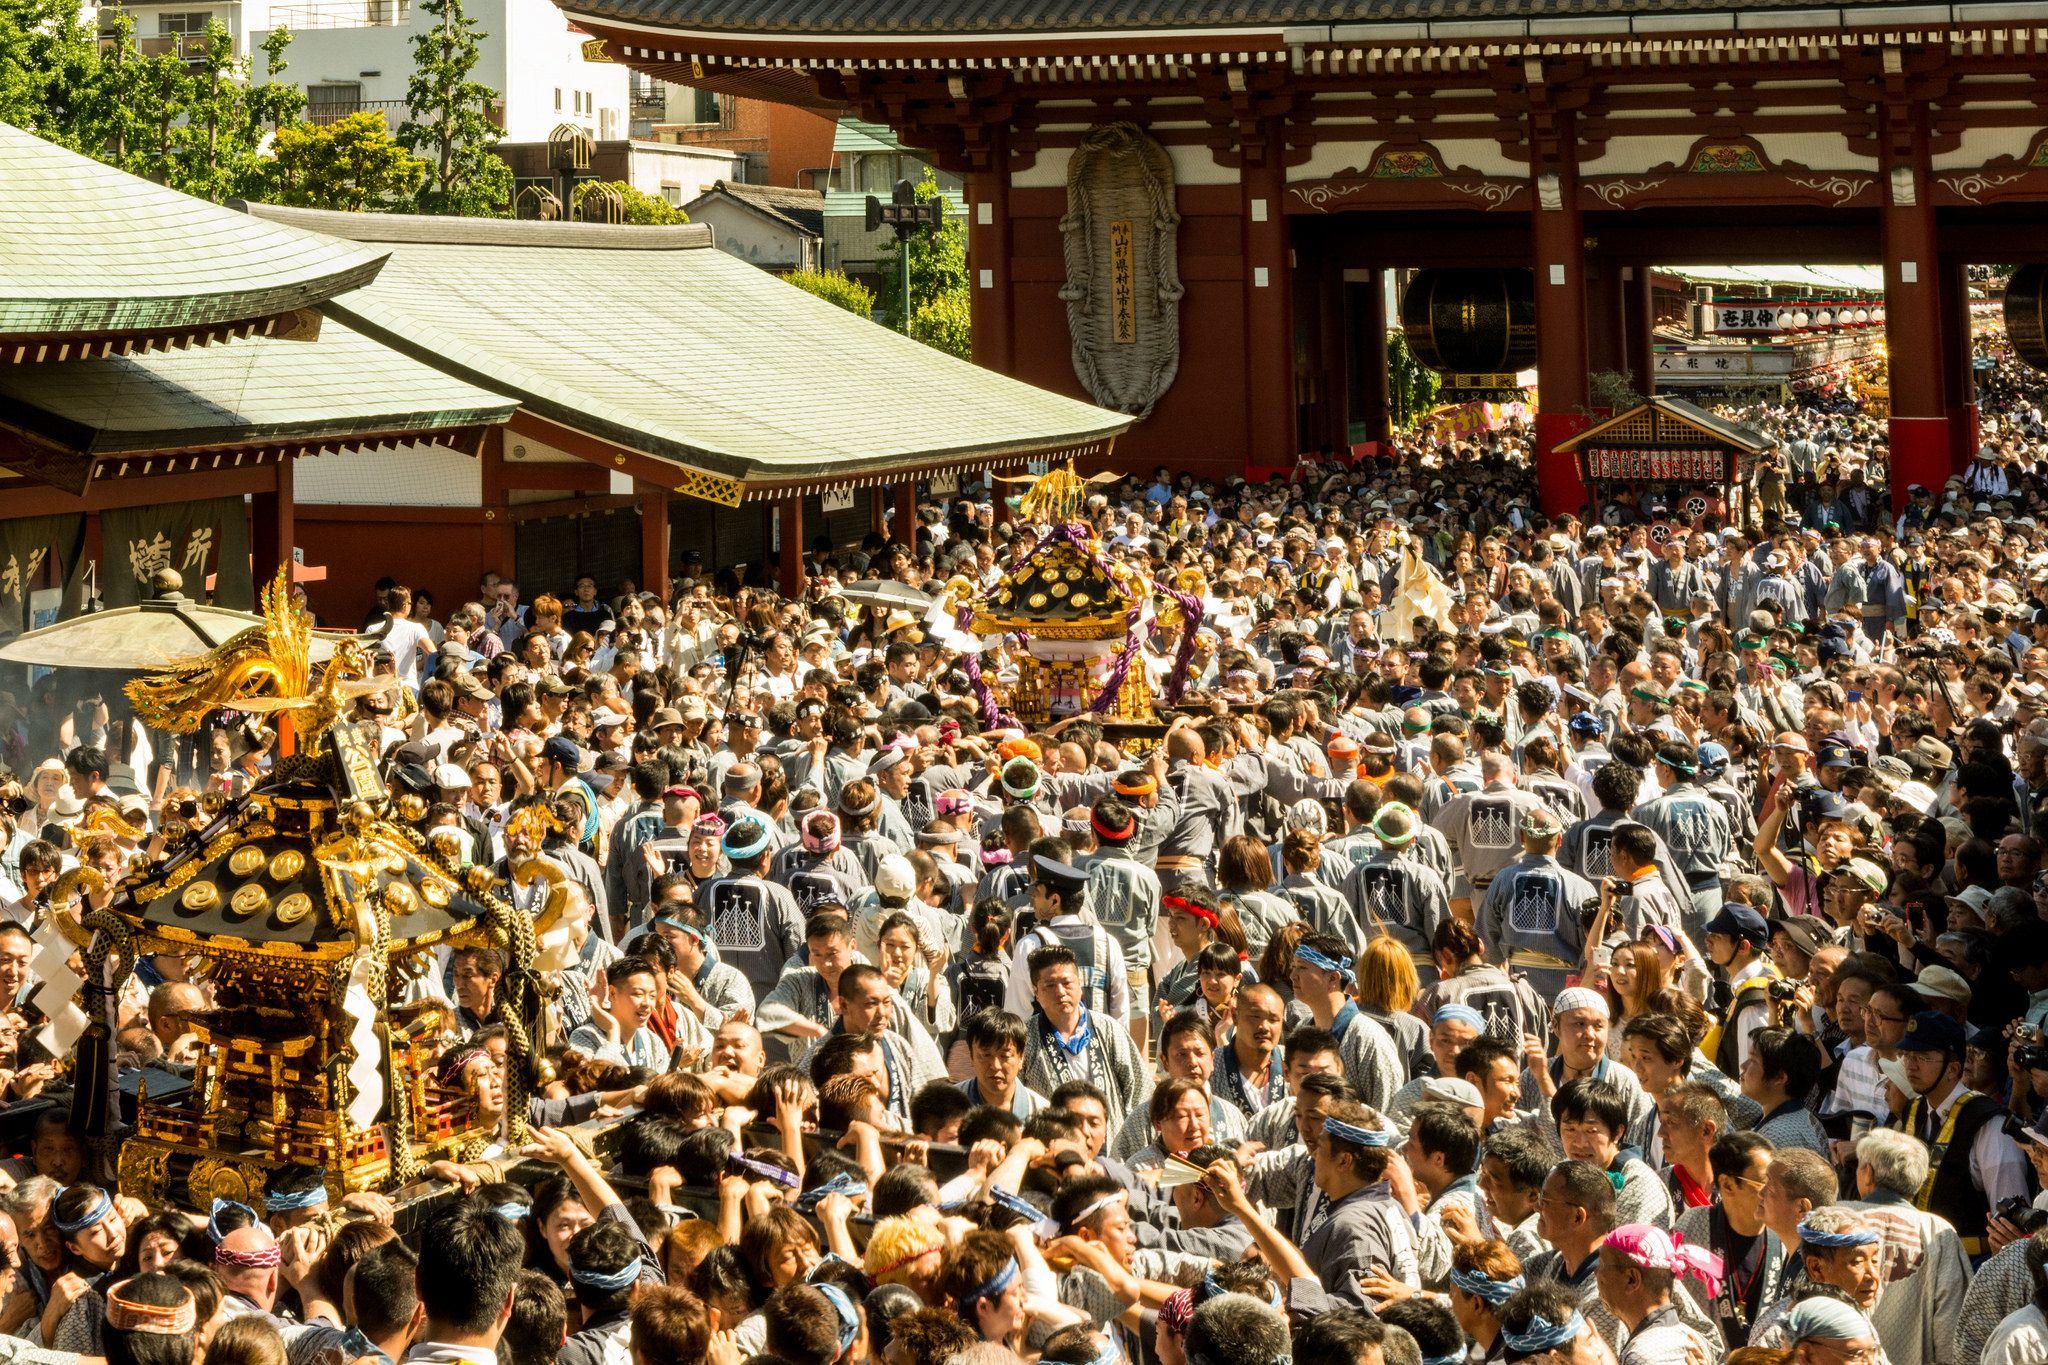 Festival Sanja Matsuri, Salah Satu Festival Terbesar di Tokyo Yang Menjadi Pesona Asakusa